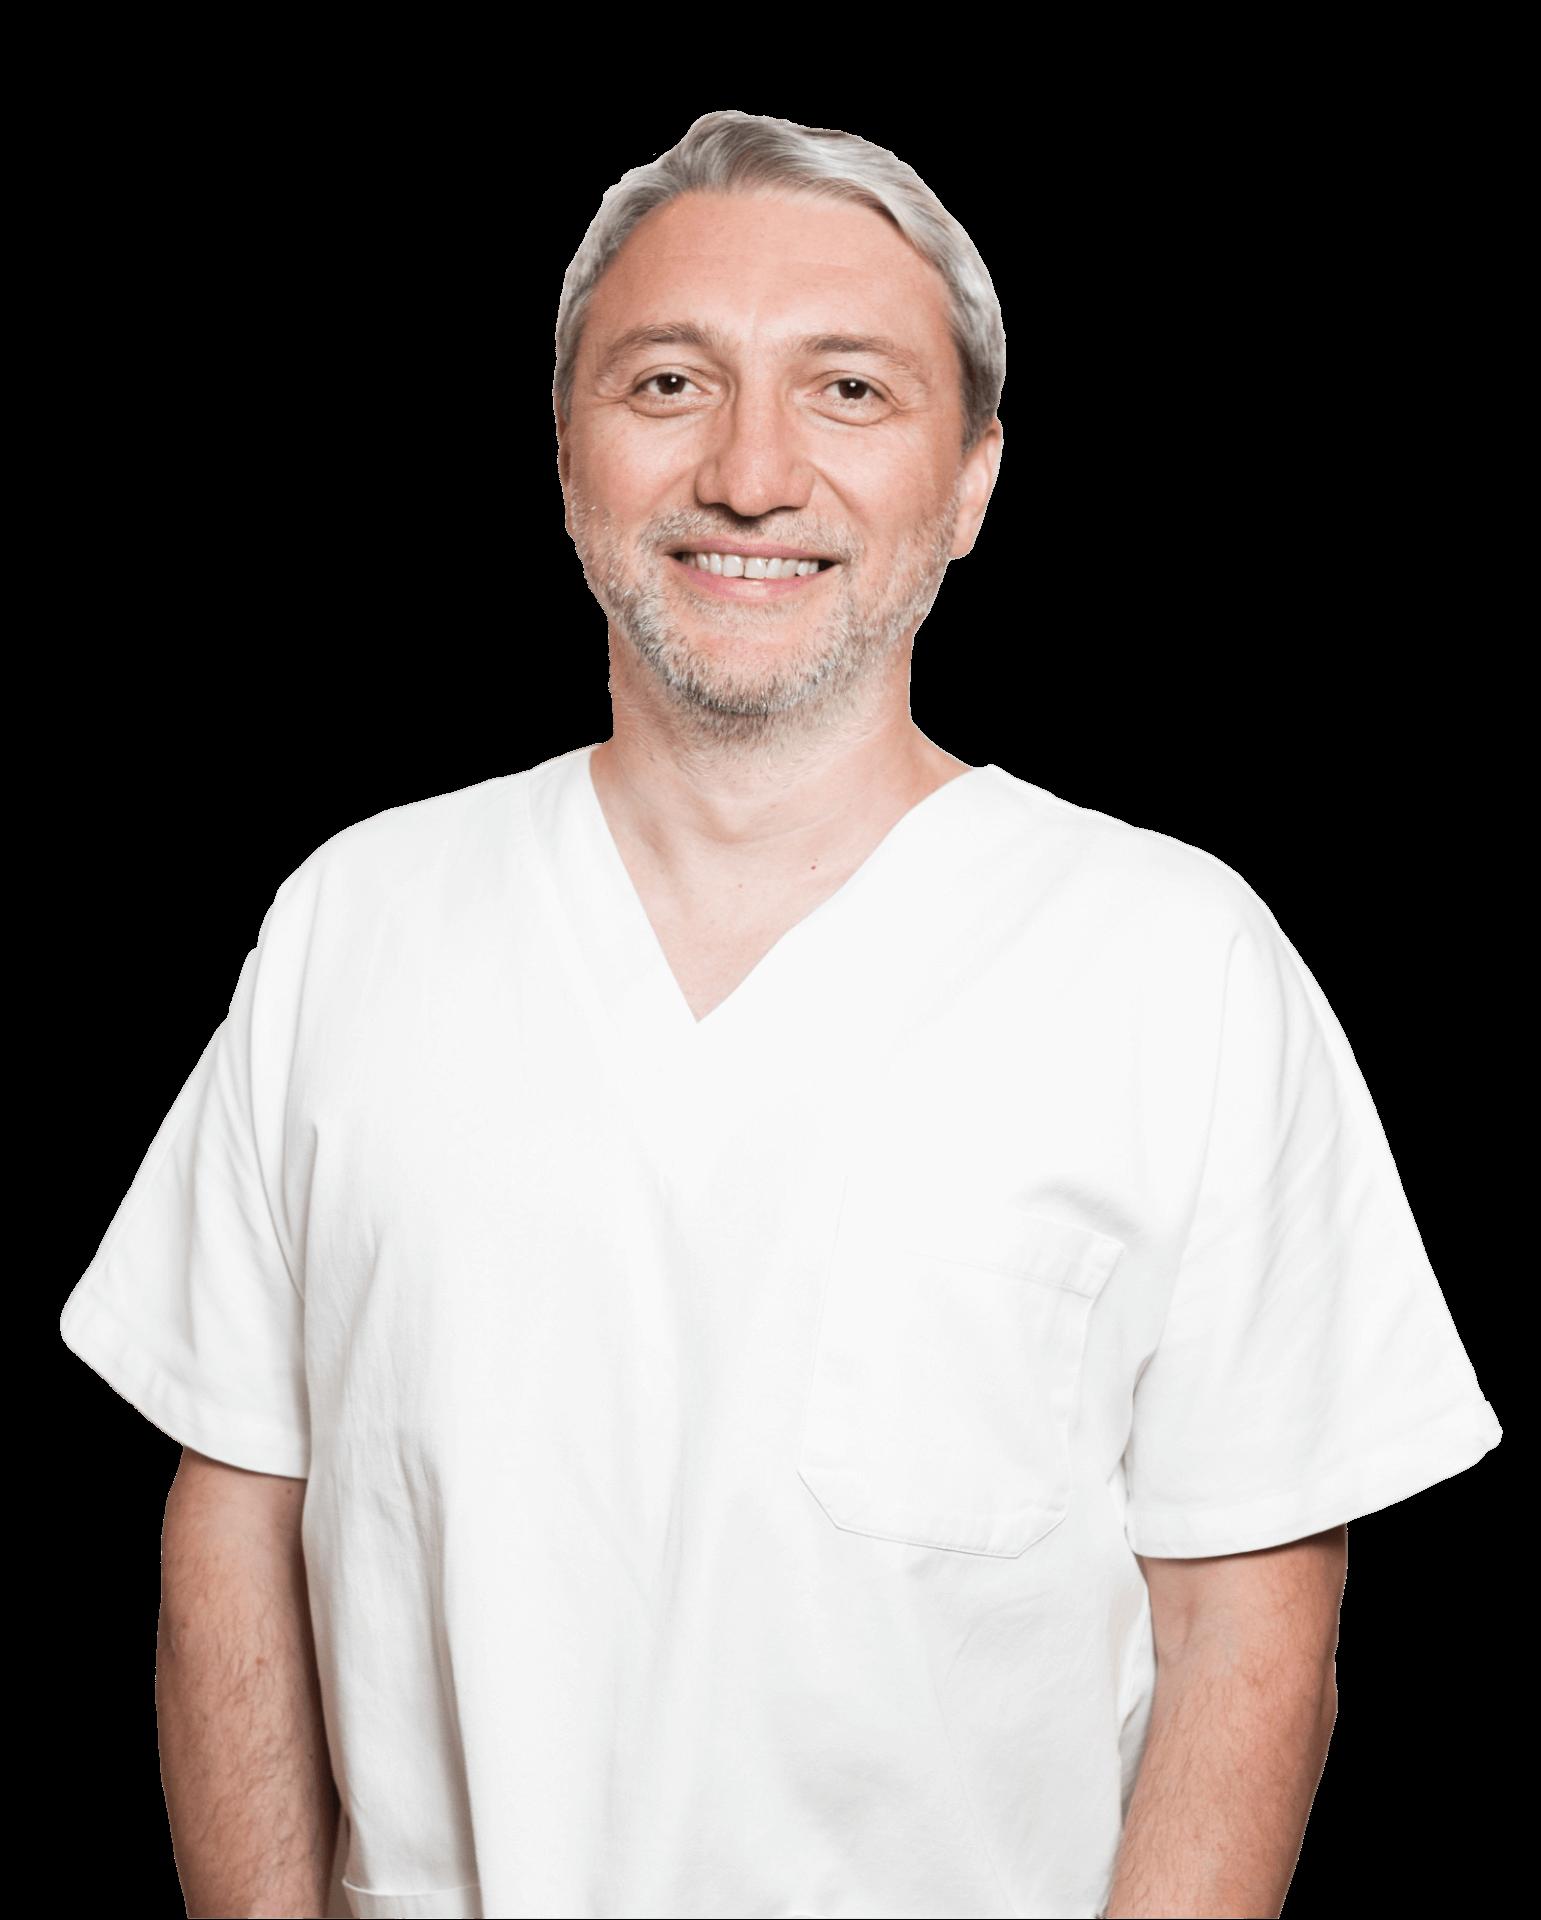 врач стоматолог Капланов